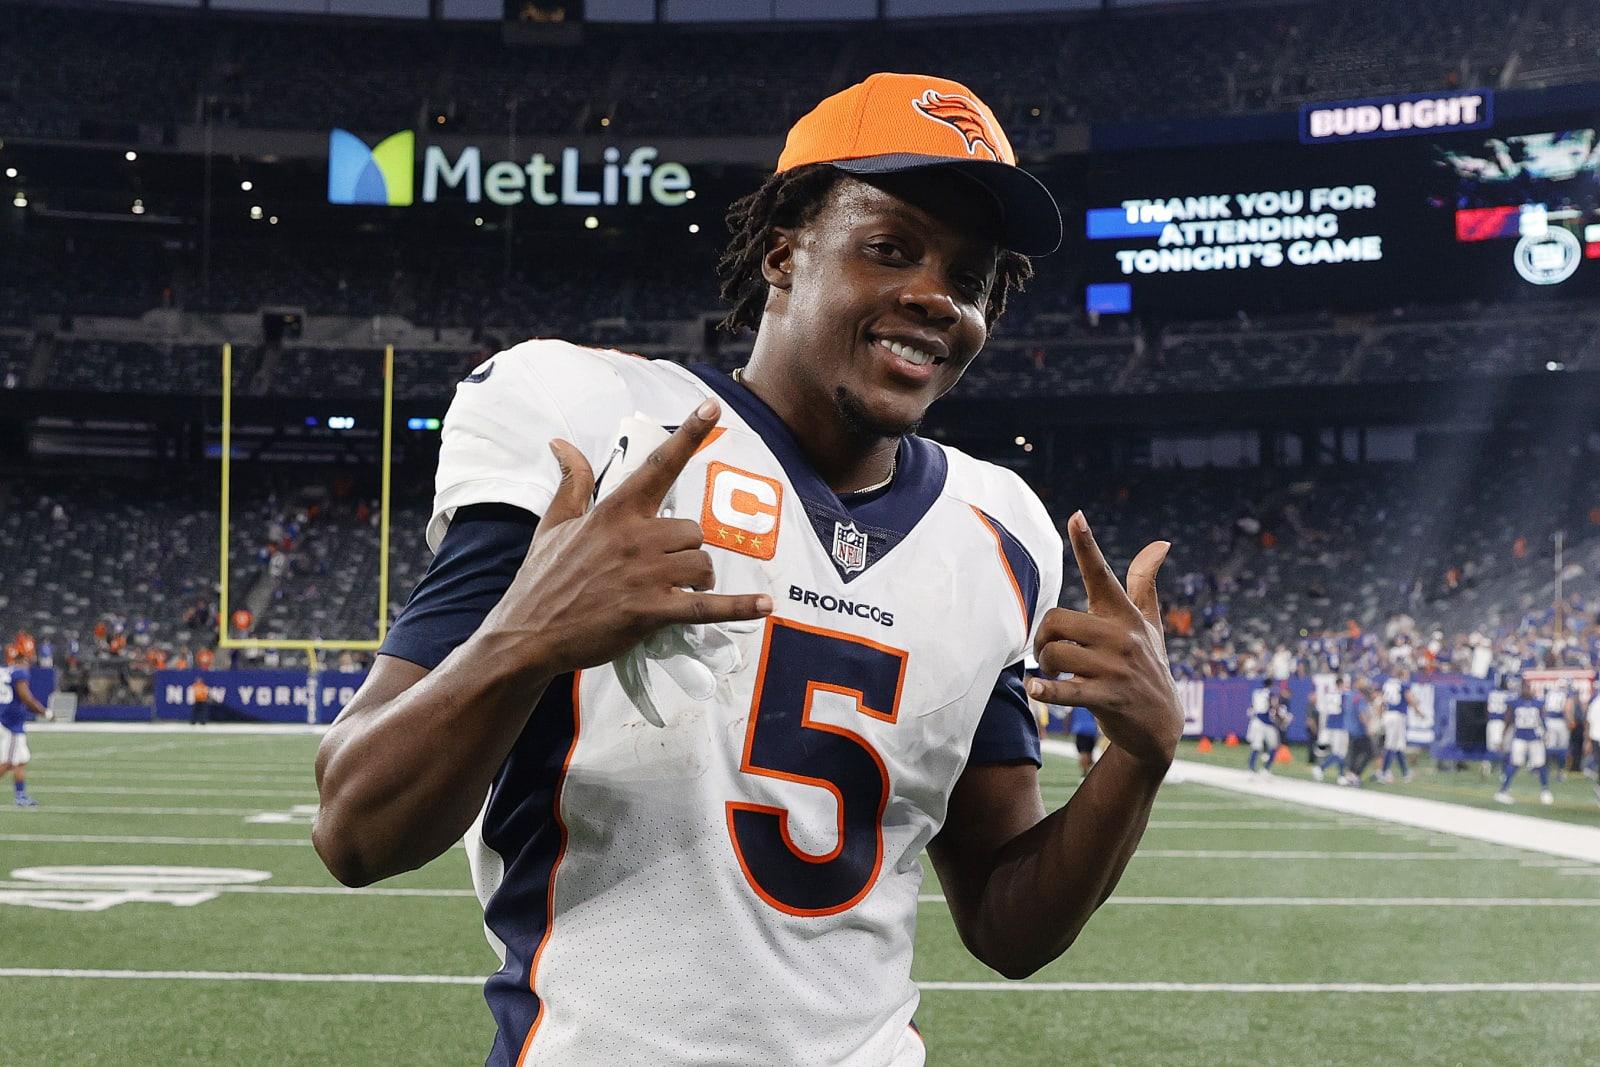 Teddy Bridgewater, Denver Broncos